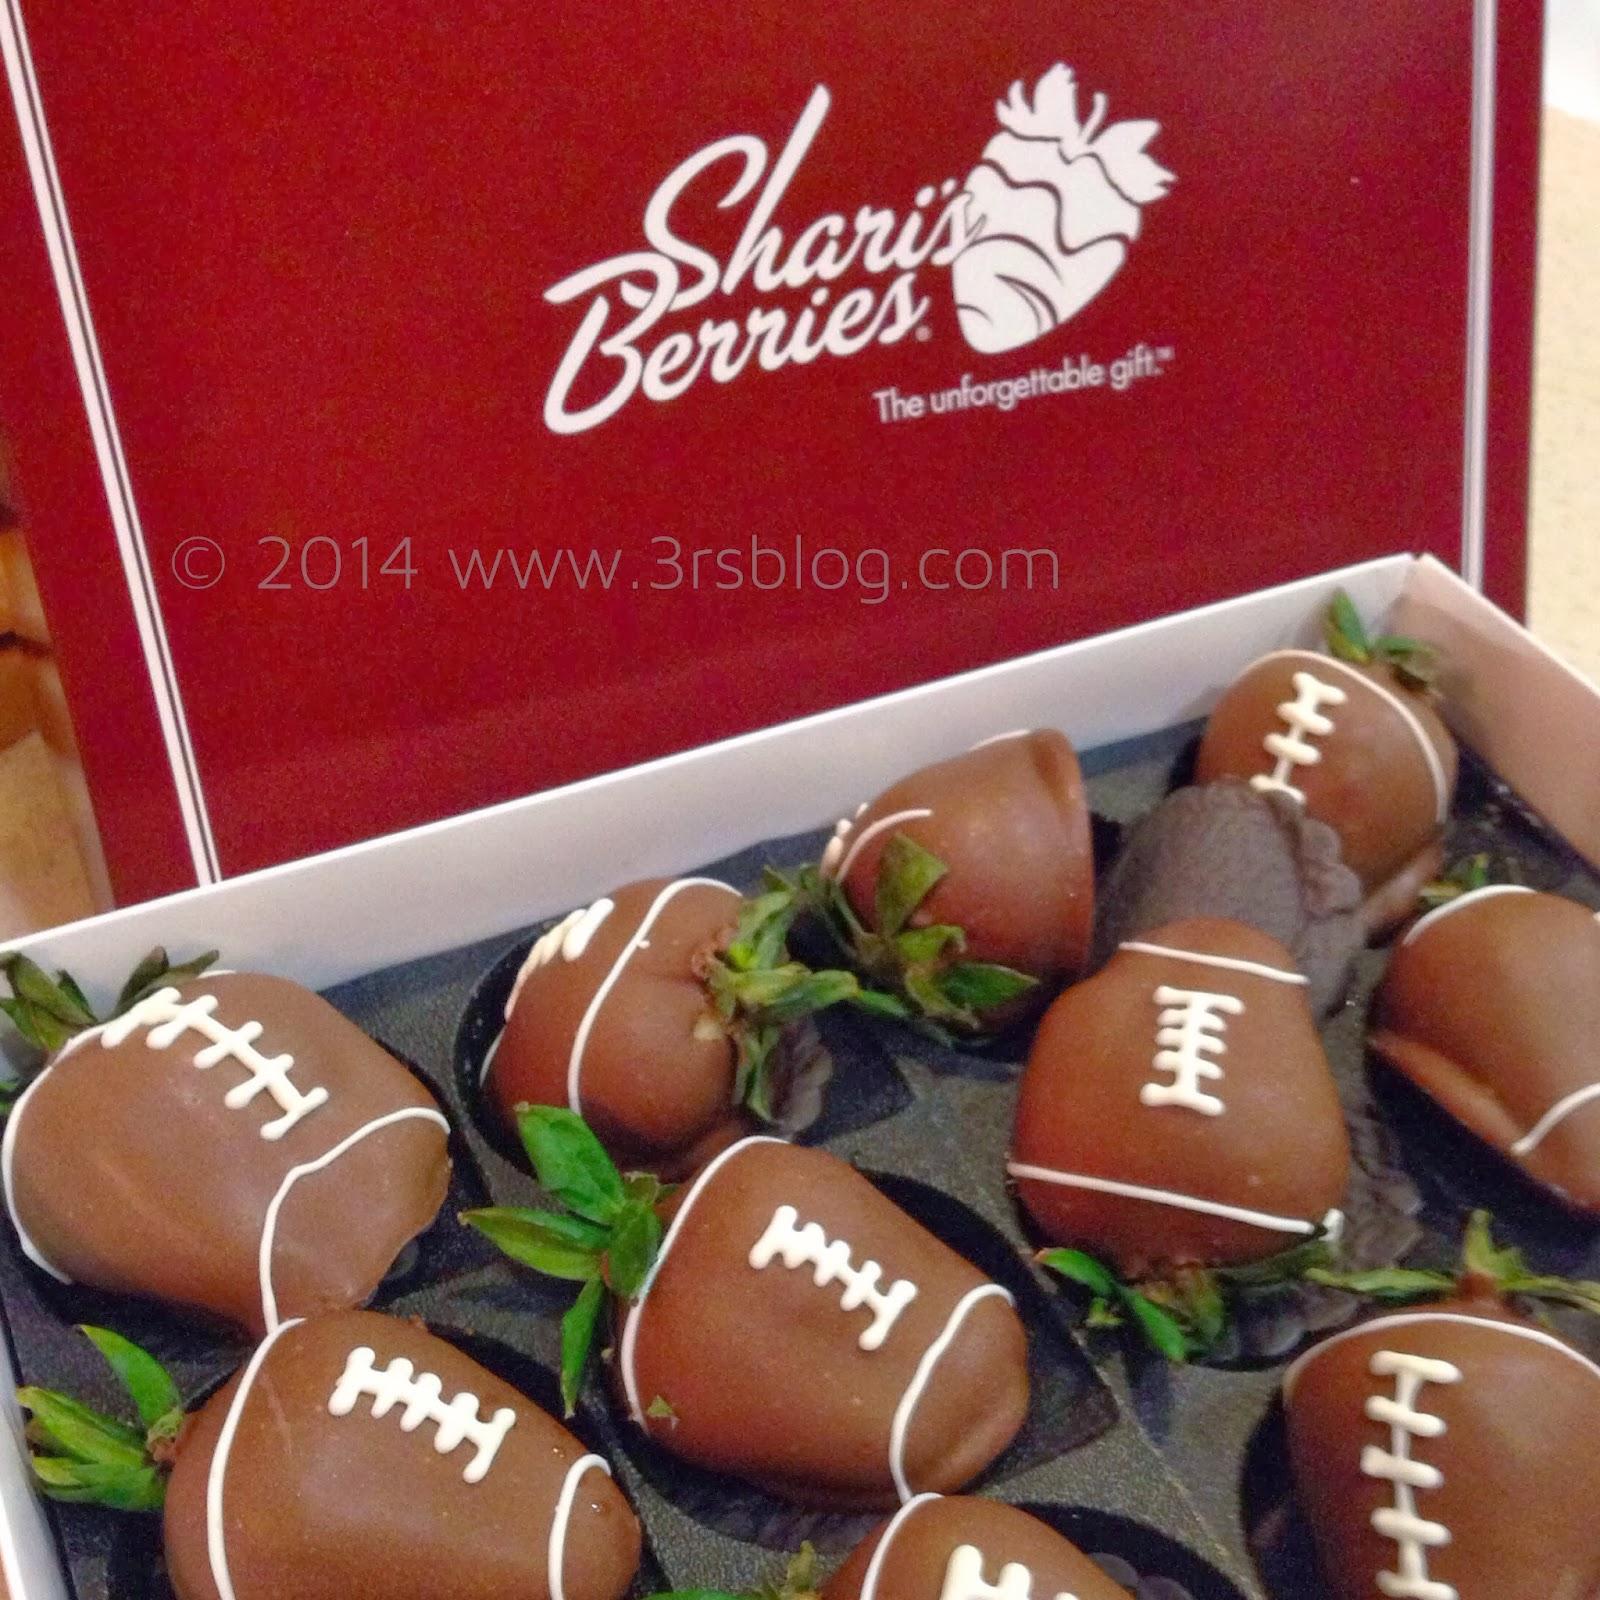 Chcolate Dipped Football Strawberries SharisBerries